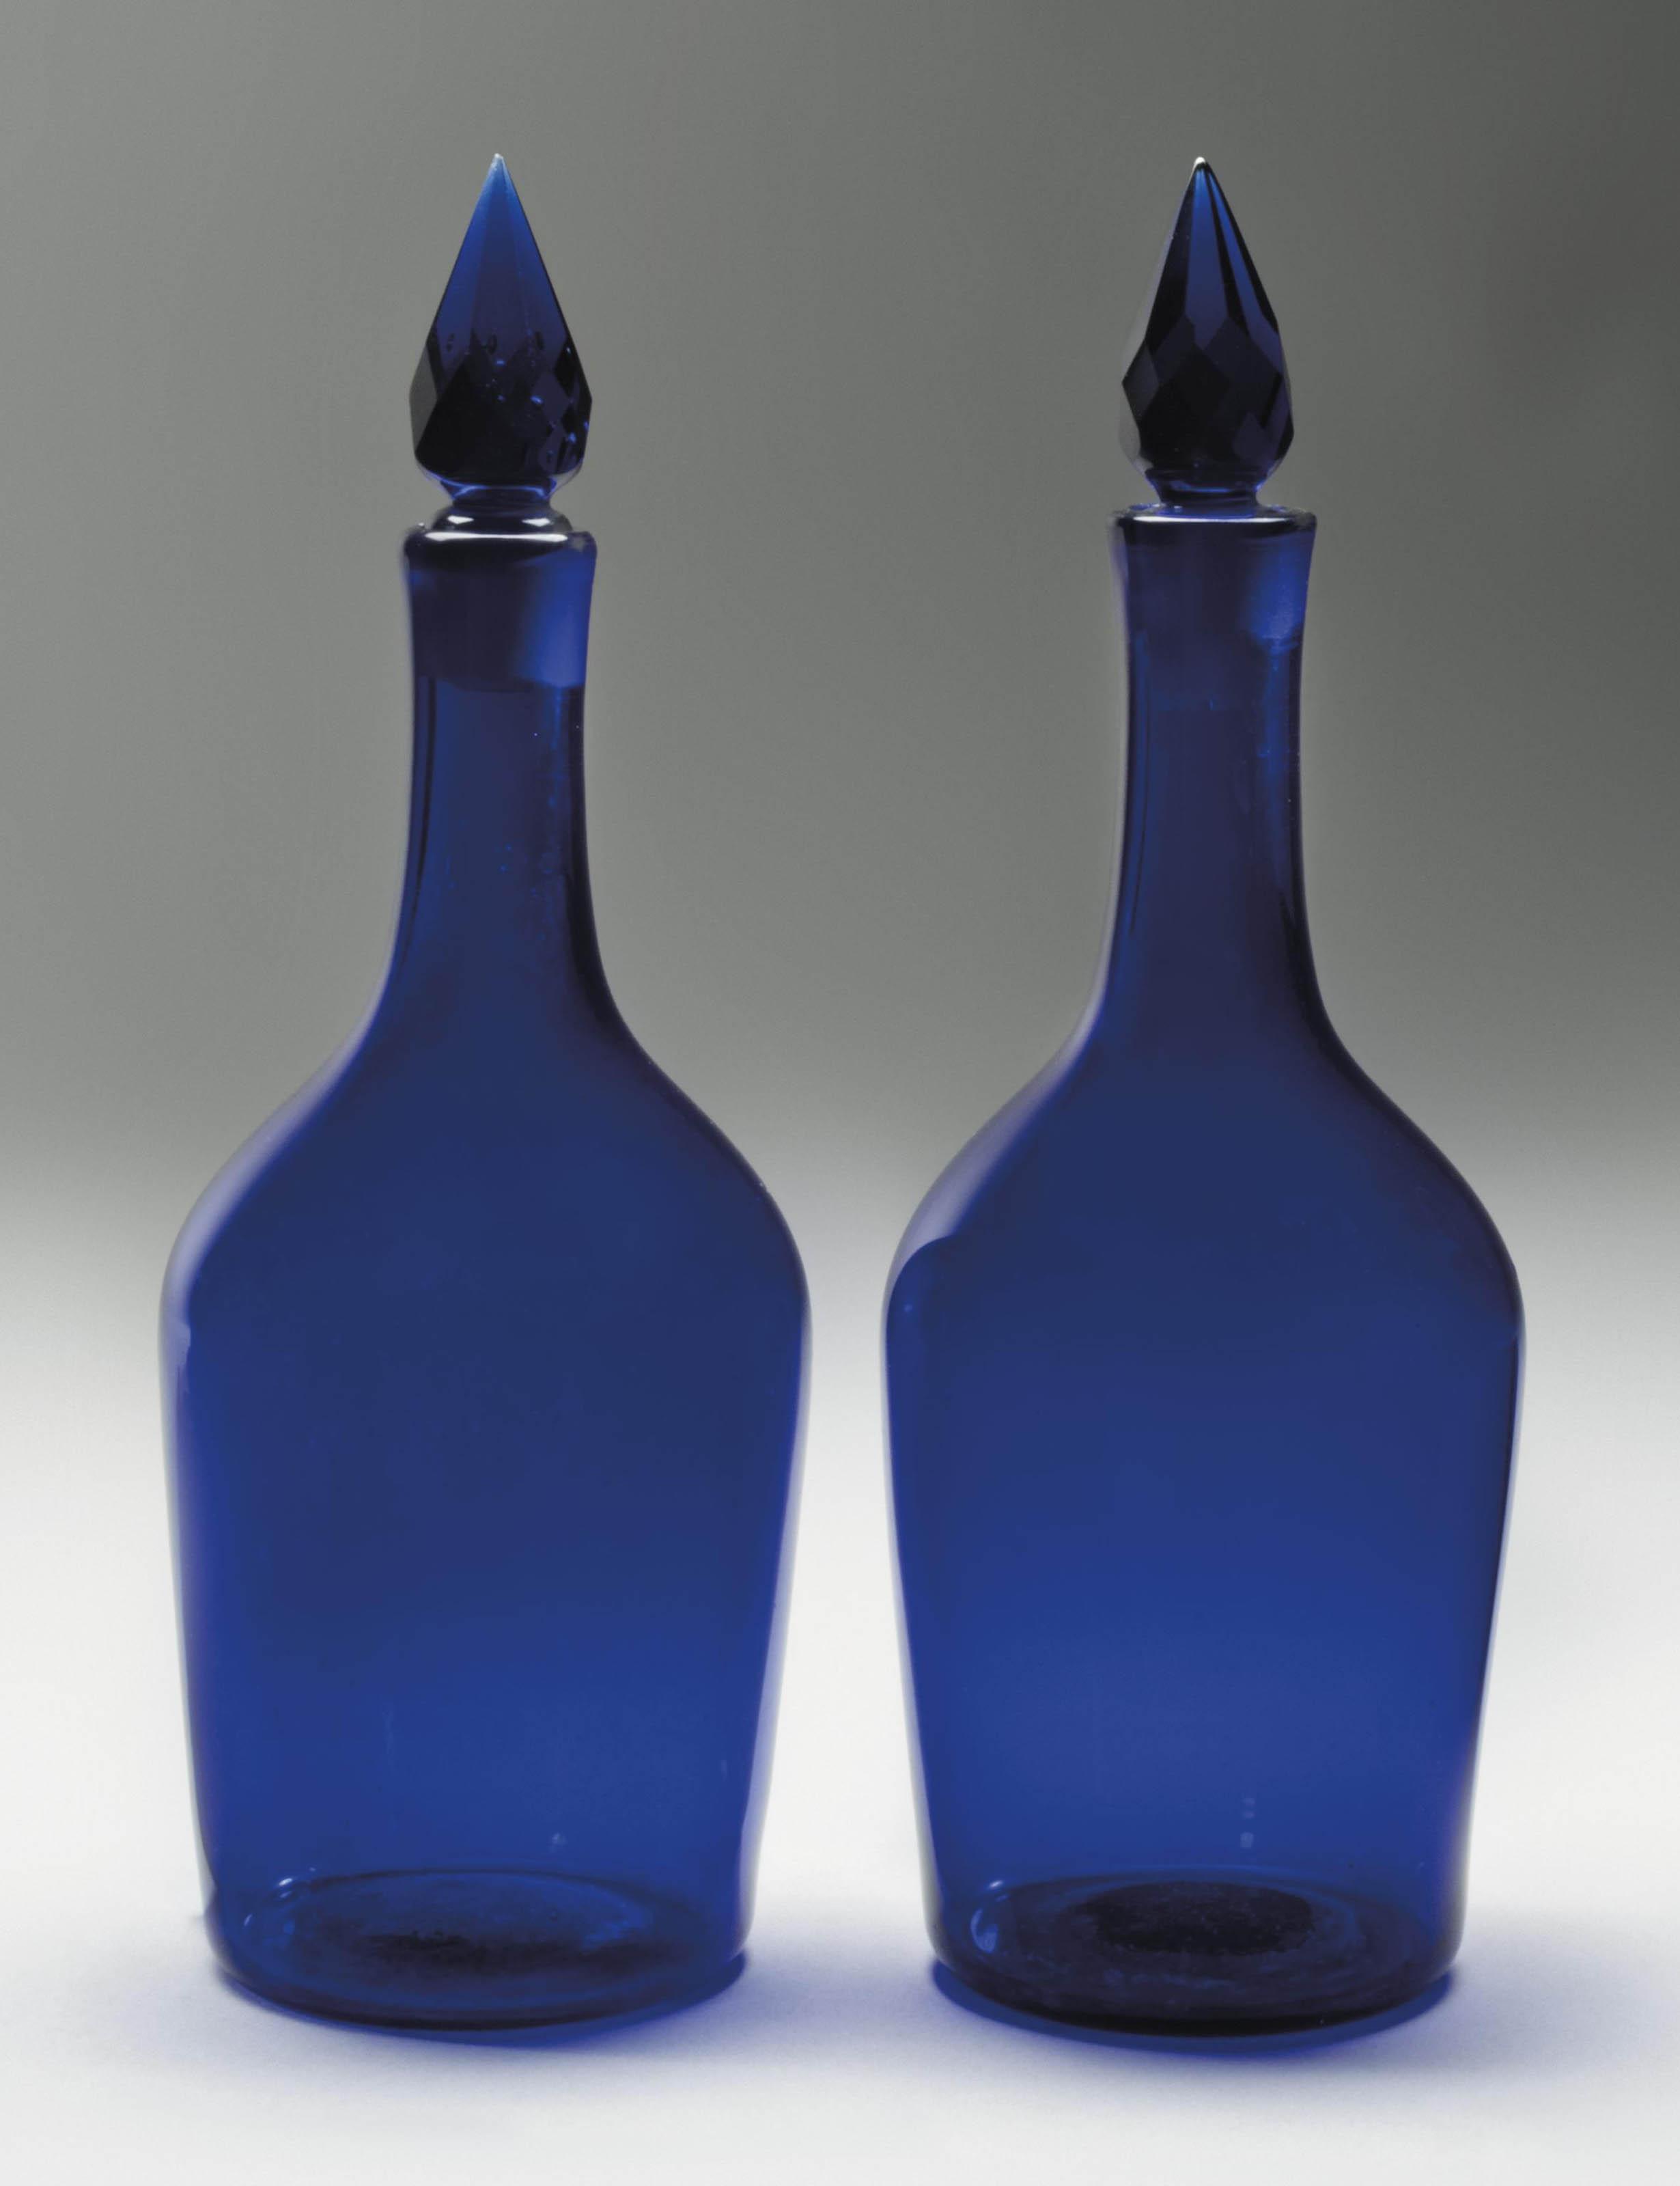 A PAIR OF BLUE GLASS CLUB-SHAP